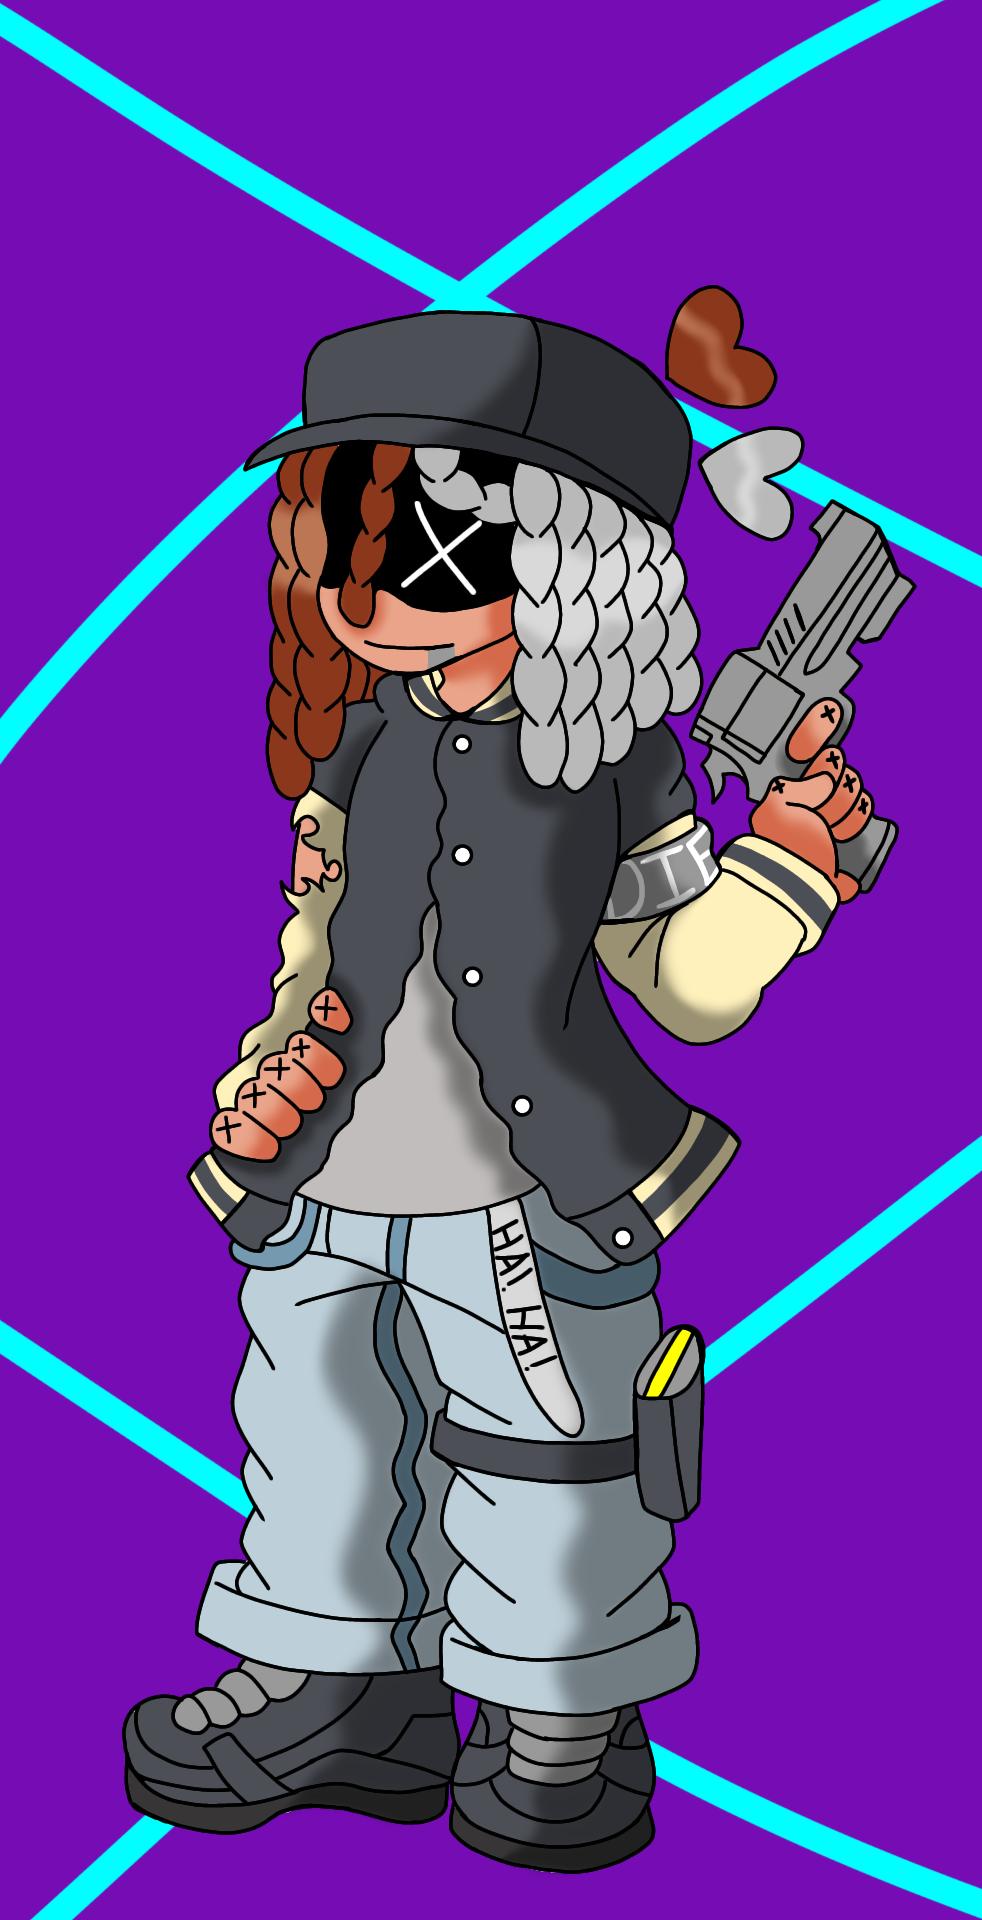 My fnf character redo